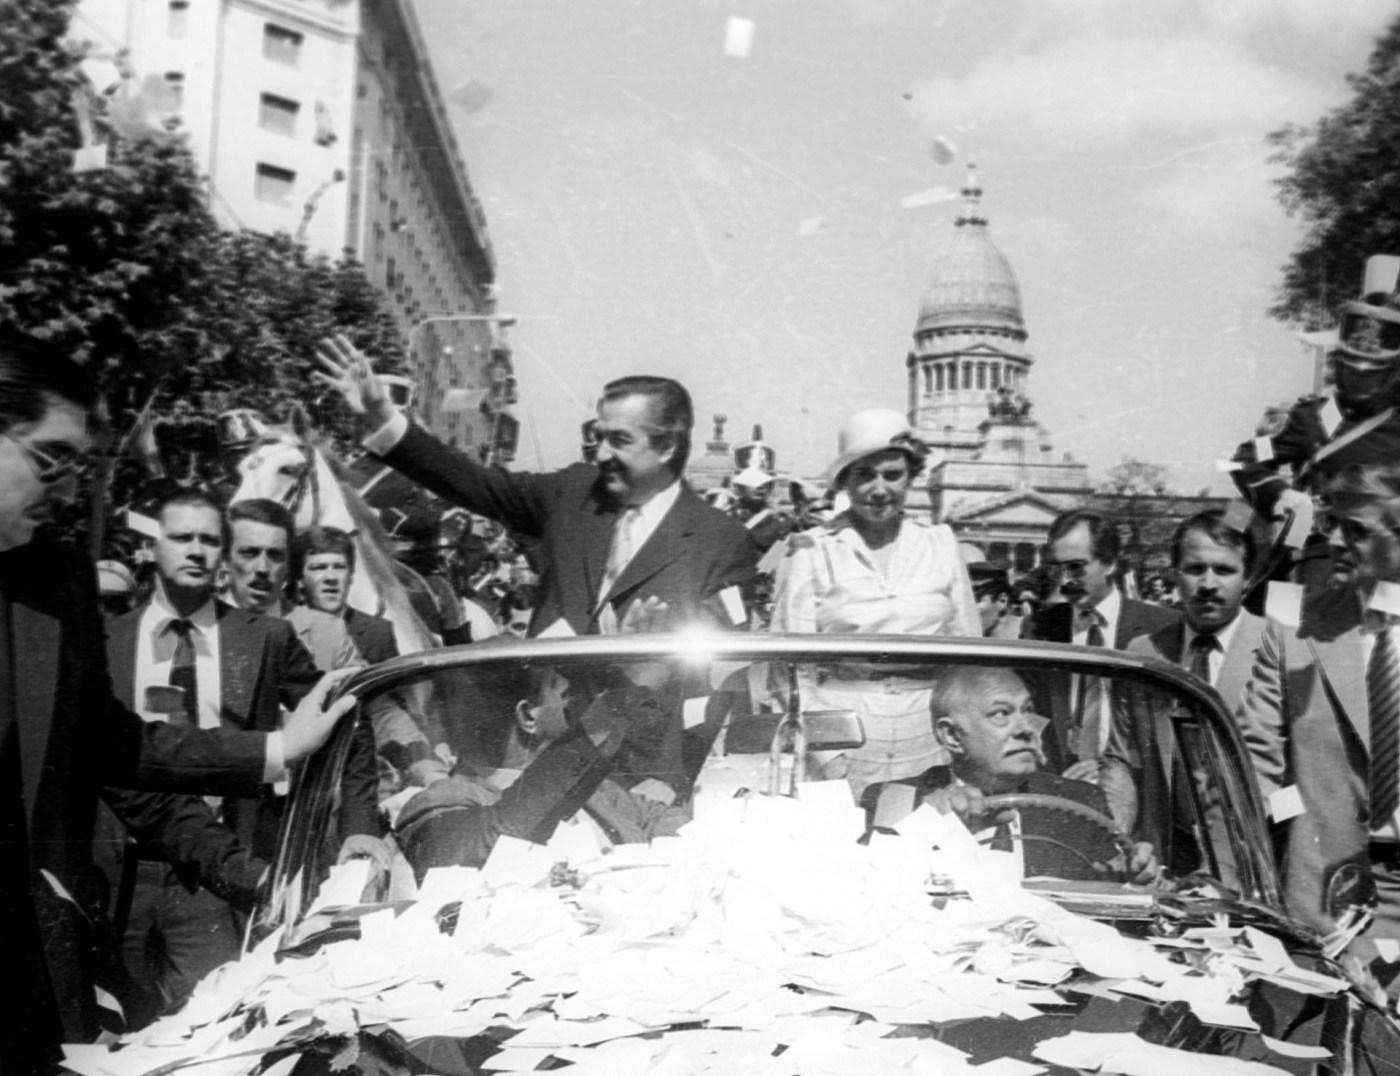 El 10 de diciembre de 1983 Raúl Alfonsín asumió la presidencia del país